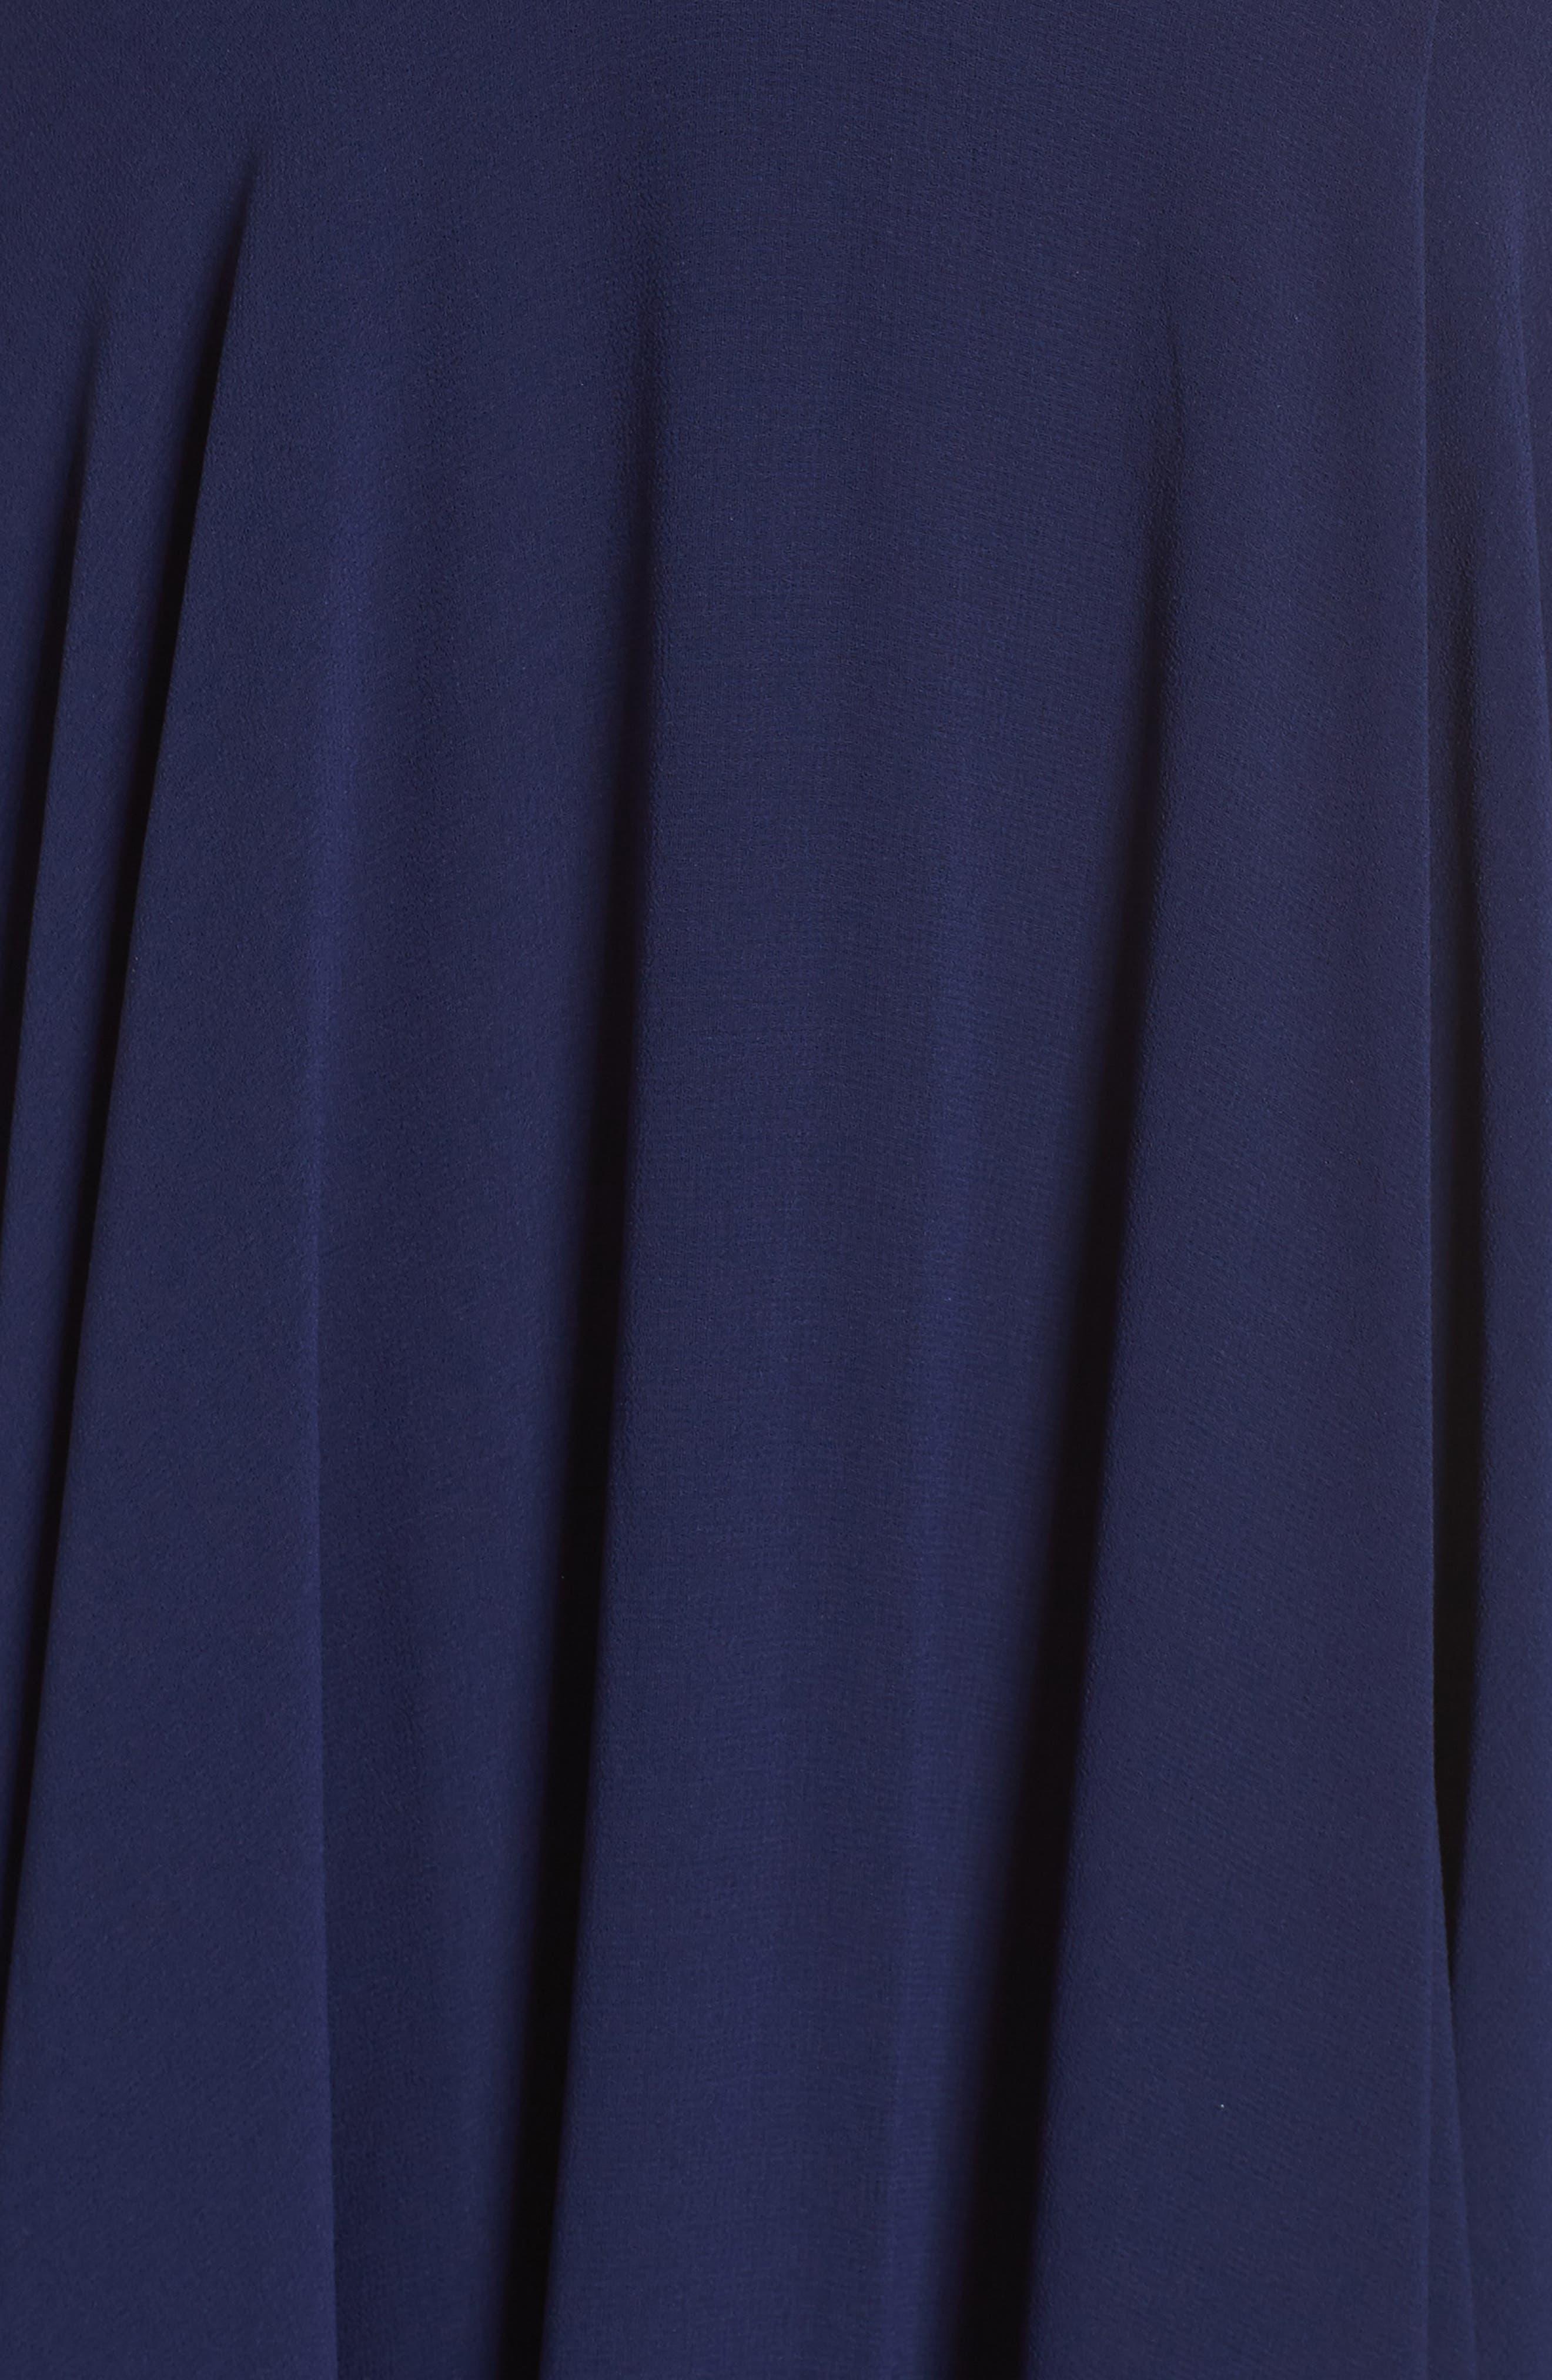 LULUS, Surplice Chiffon Gown, Alternate thumbnail 6, color, NAVY